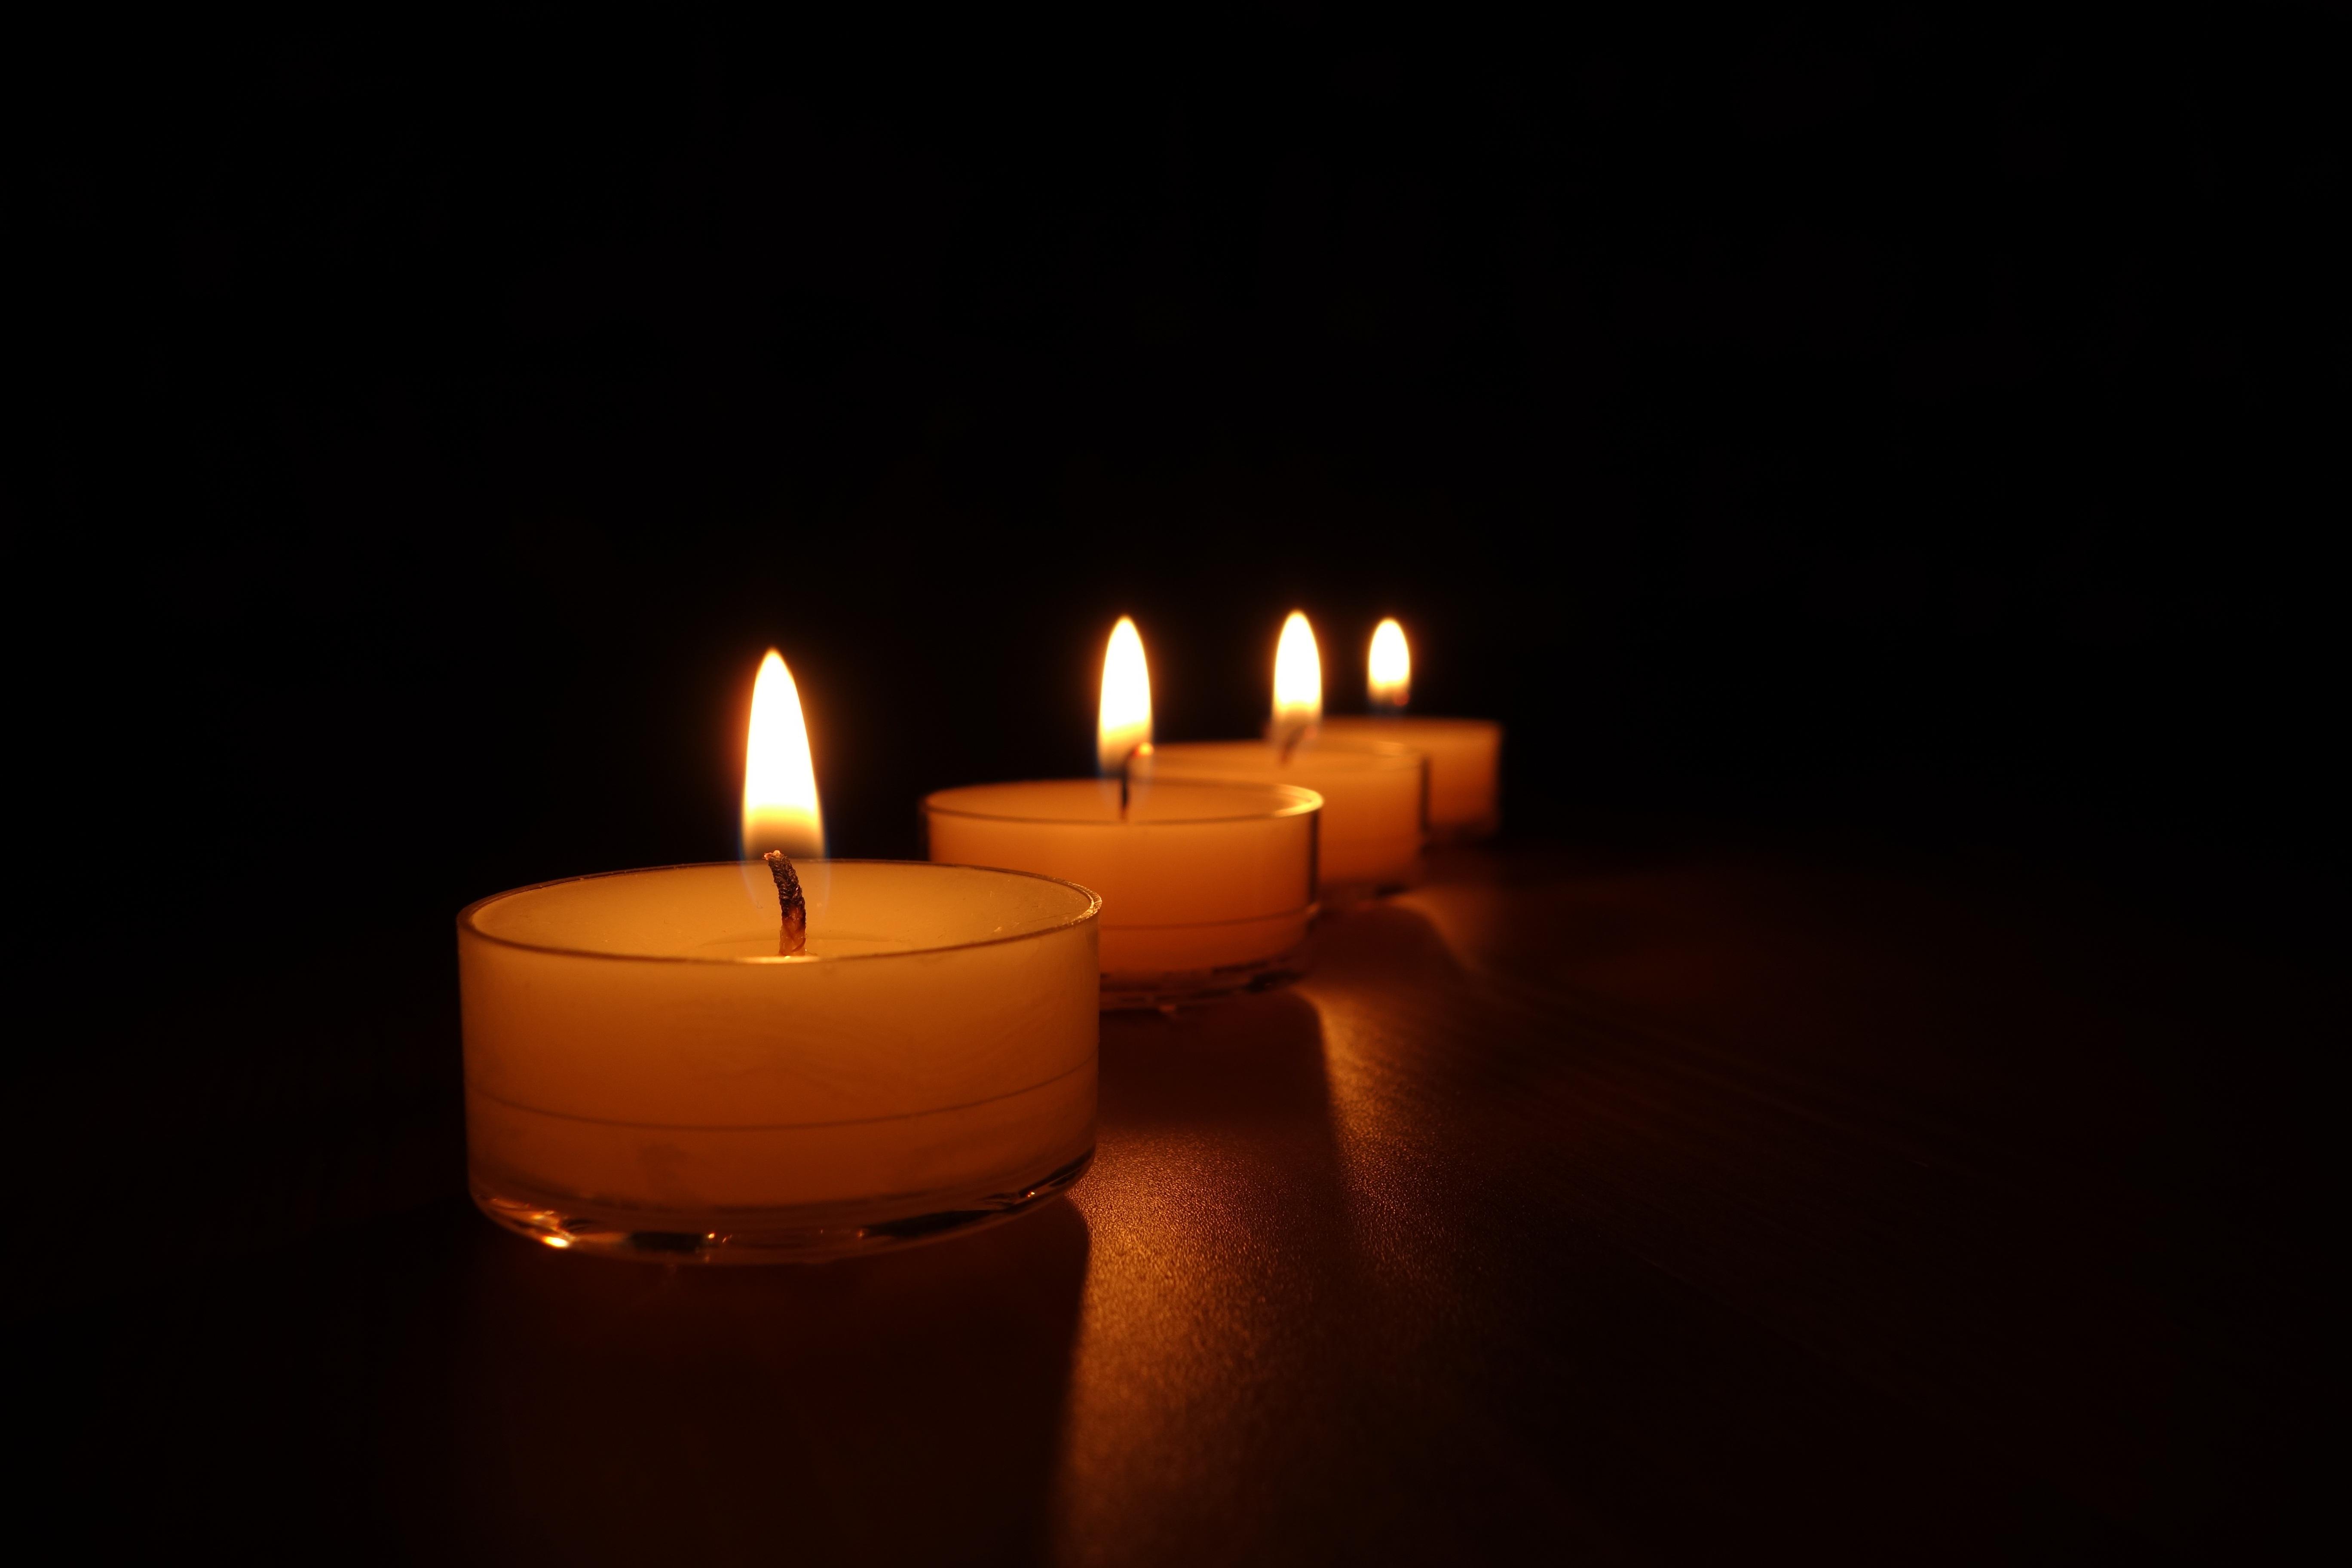 Licht Nacht  Atmosphäre Rot Flamme Romantik Romantisch Glühen Dunkelheit  Gelb Kerze Weihnachten Beleuchtung Leuchter Brennen